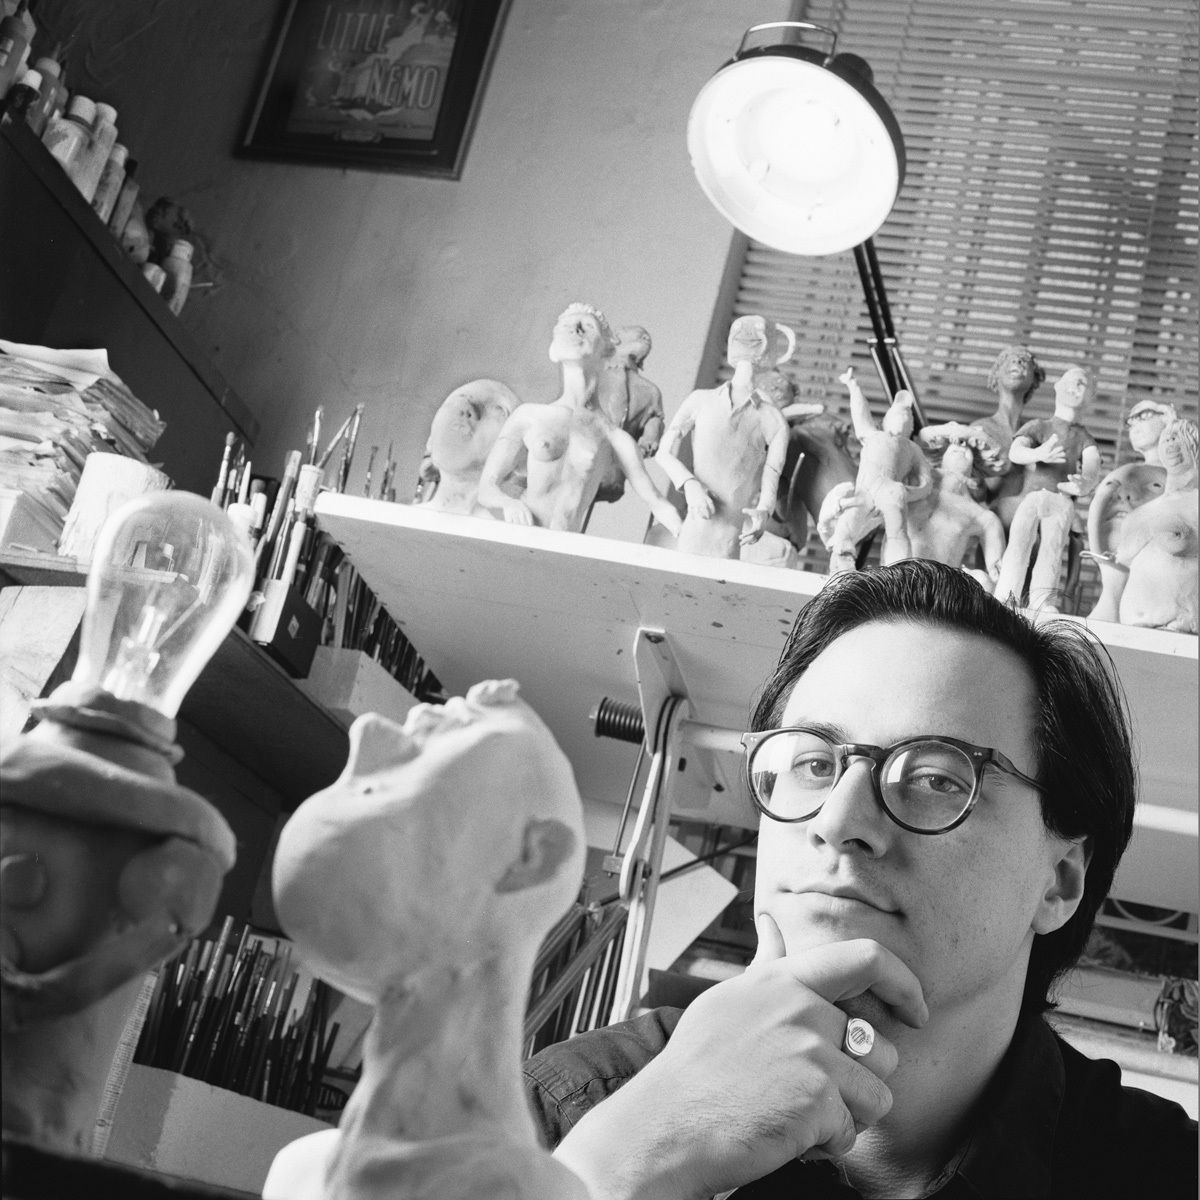 David Chelsea: Graphic Novel Illustrator/Author